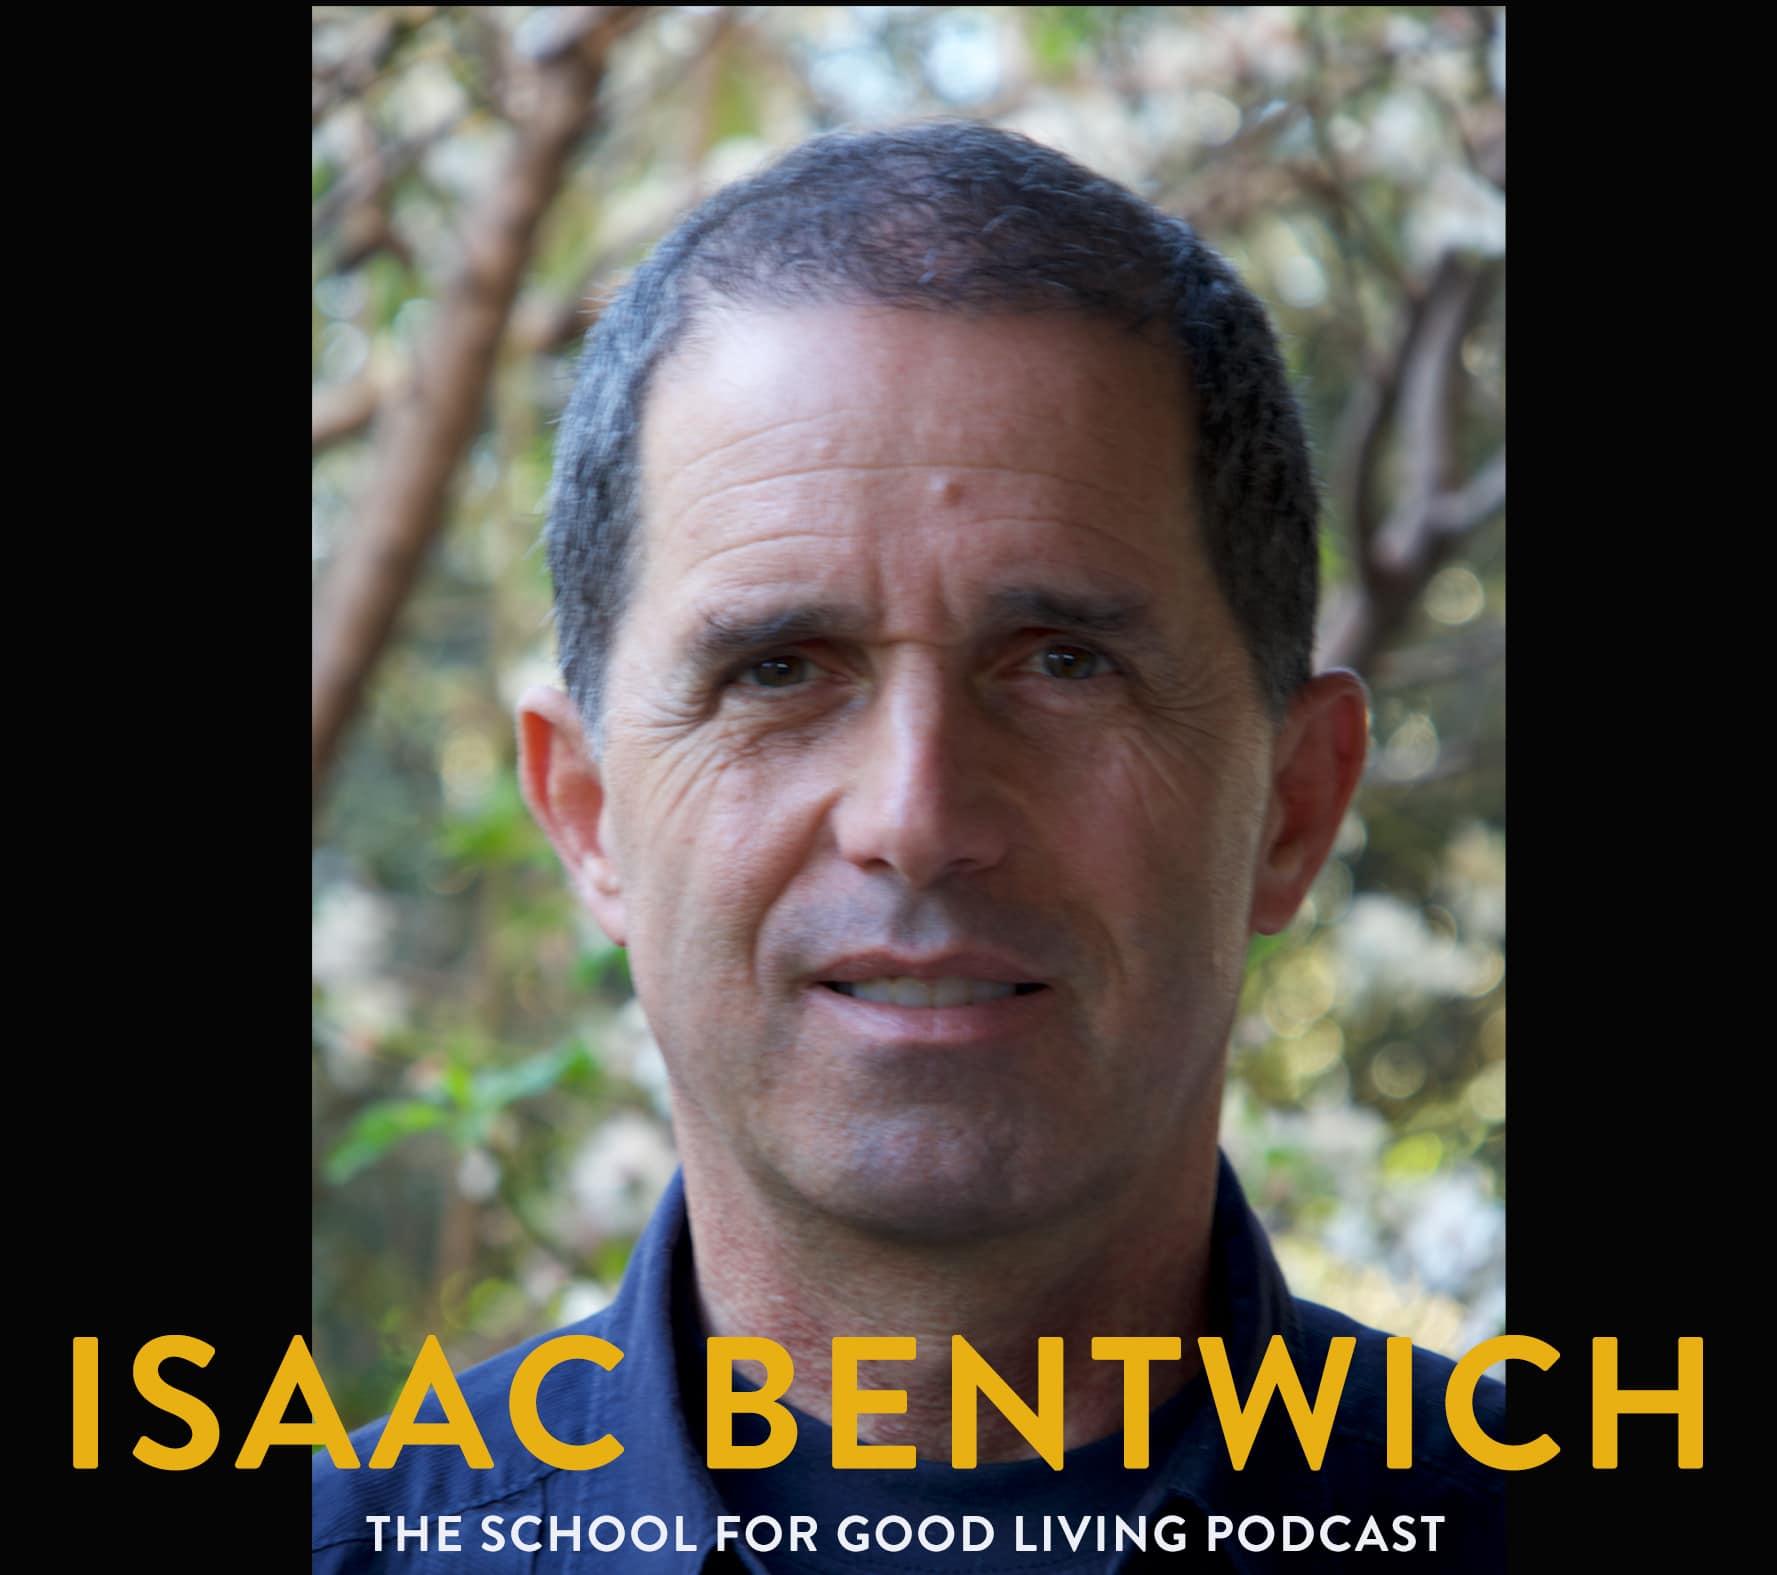 088 IsaacBentwich Insta Art